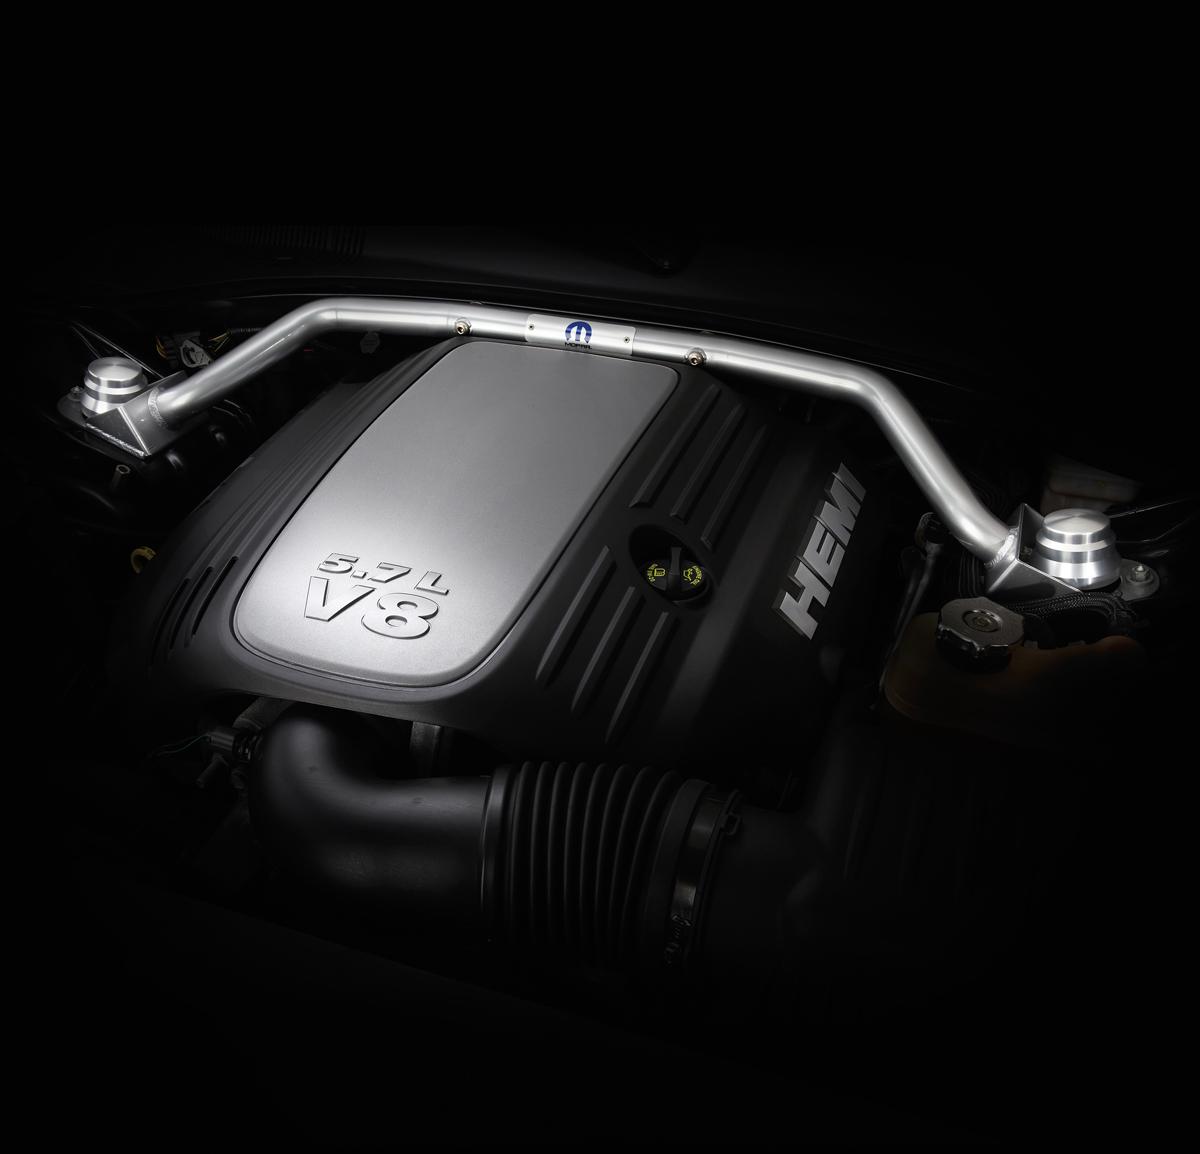 2015 challenger cold intake add horsepower autos post